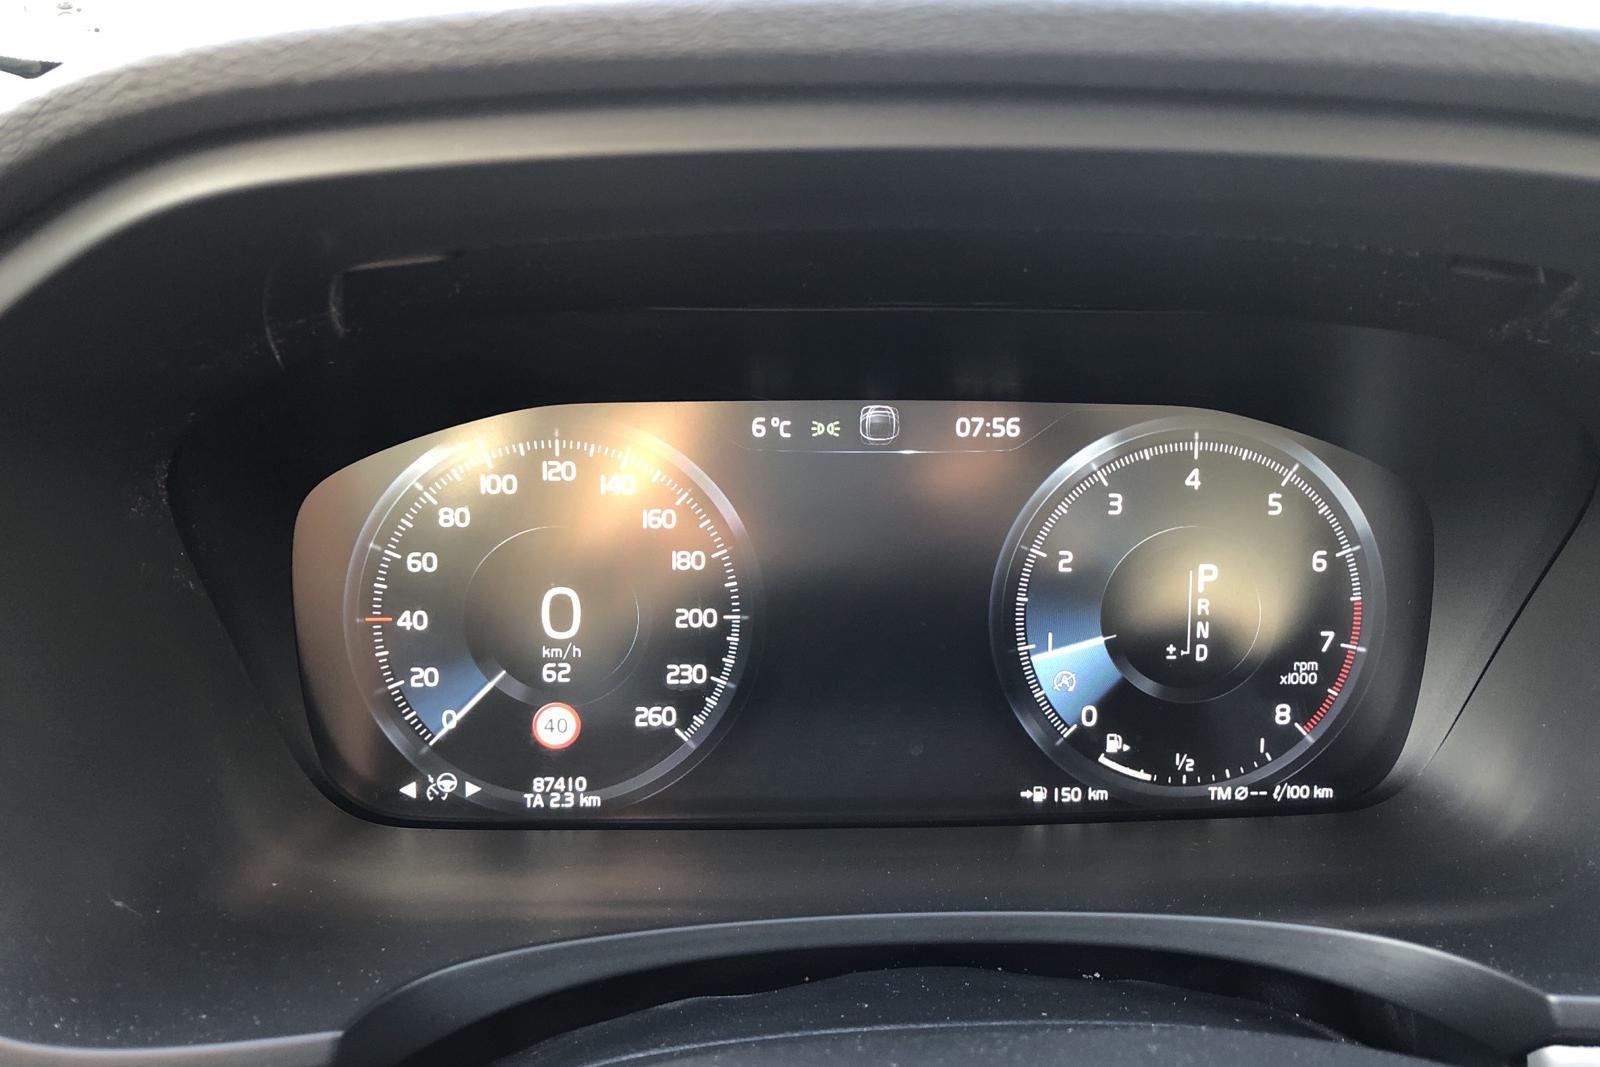 Volvo V90 T5 Bi-Fuel (254hk) - 87 410 km - Automatic - gray - 2018